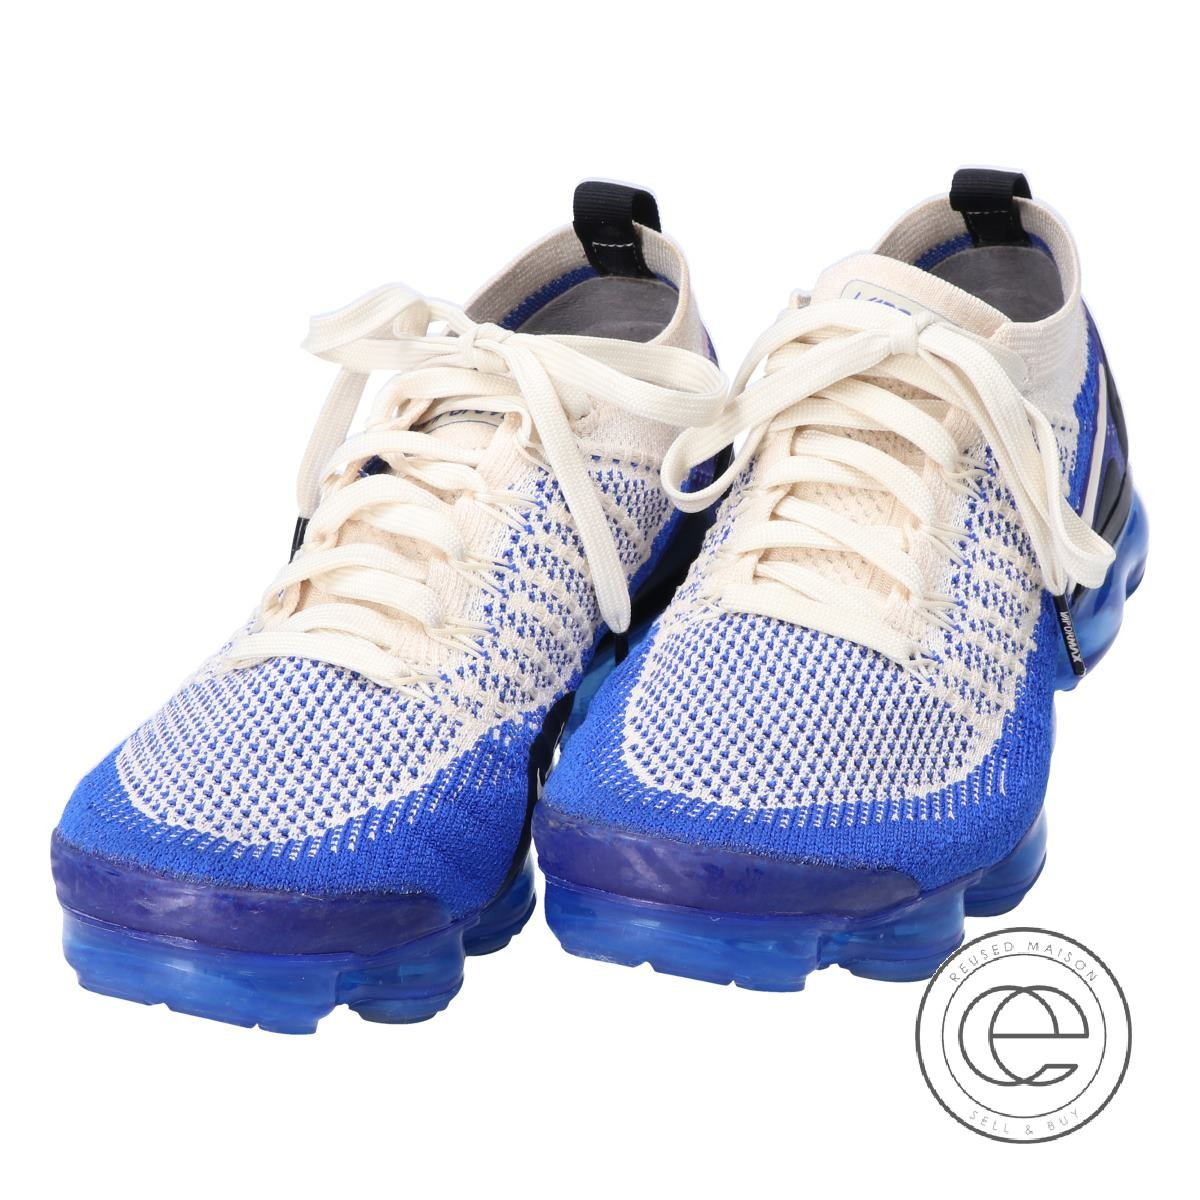 sports shoes 10a1b f1df6 NIKE Nike 942,842-204 AIR VAPORMAX FLYKNIT 2 air vapor max fried food knit  2 sneakers 25 light cream / racer blue men